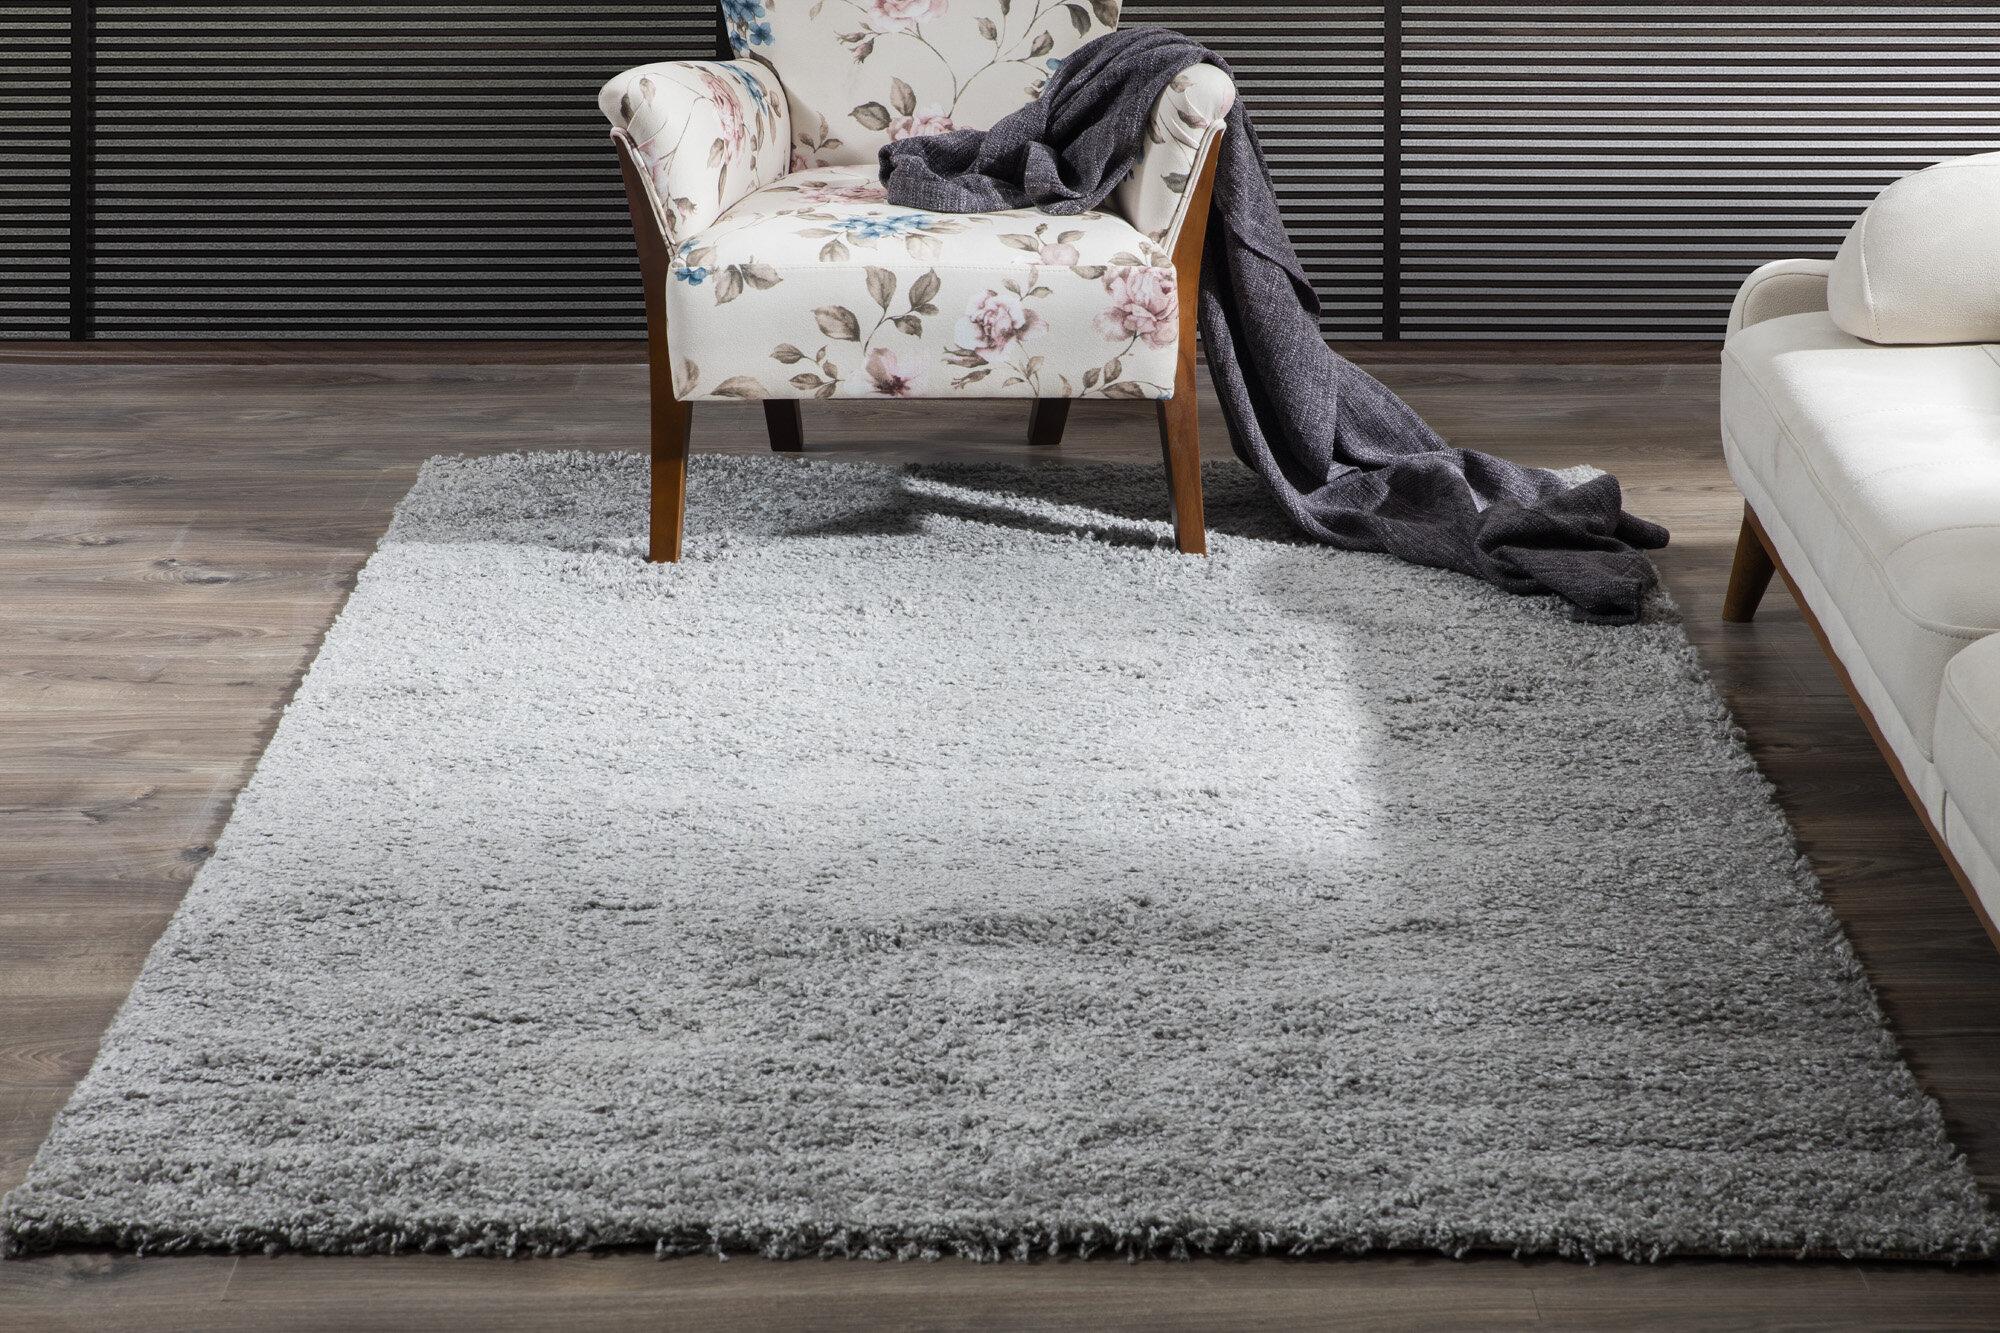 Gant Gray Area Rug By Perla Furniture